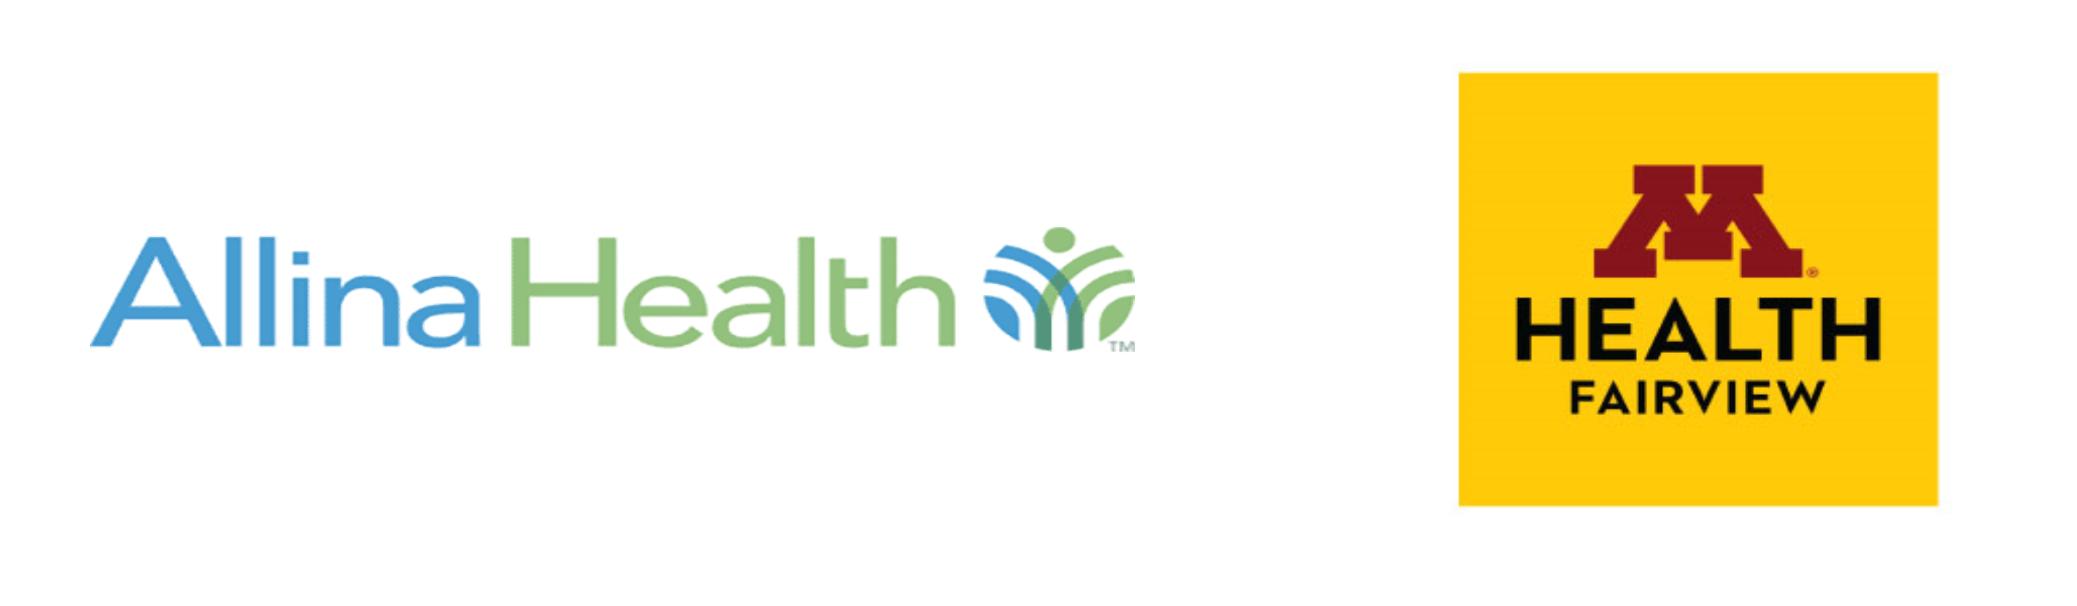 Allina Health + M Health Fairview logos